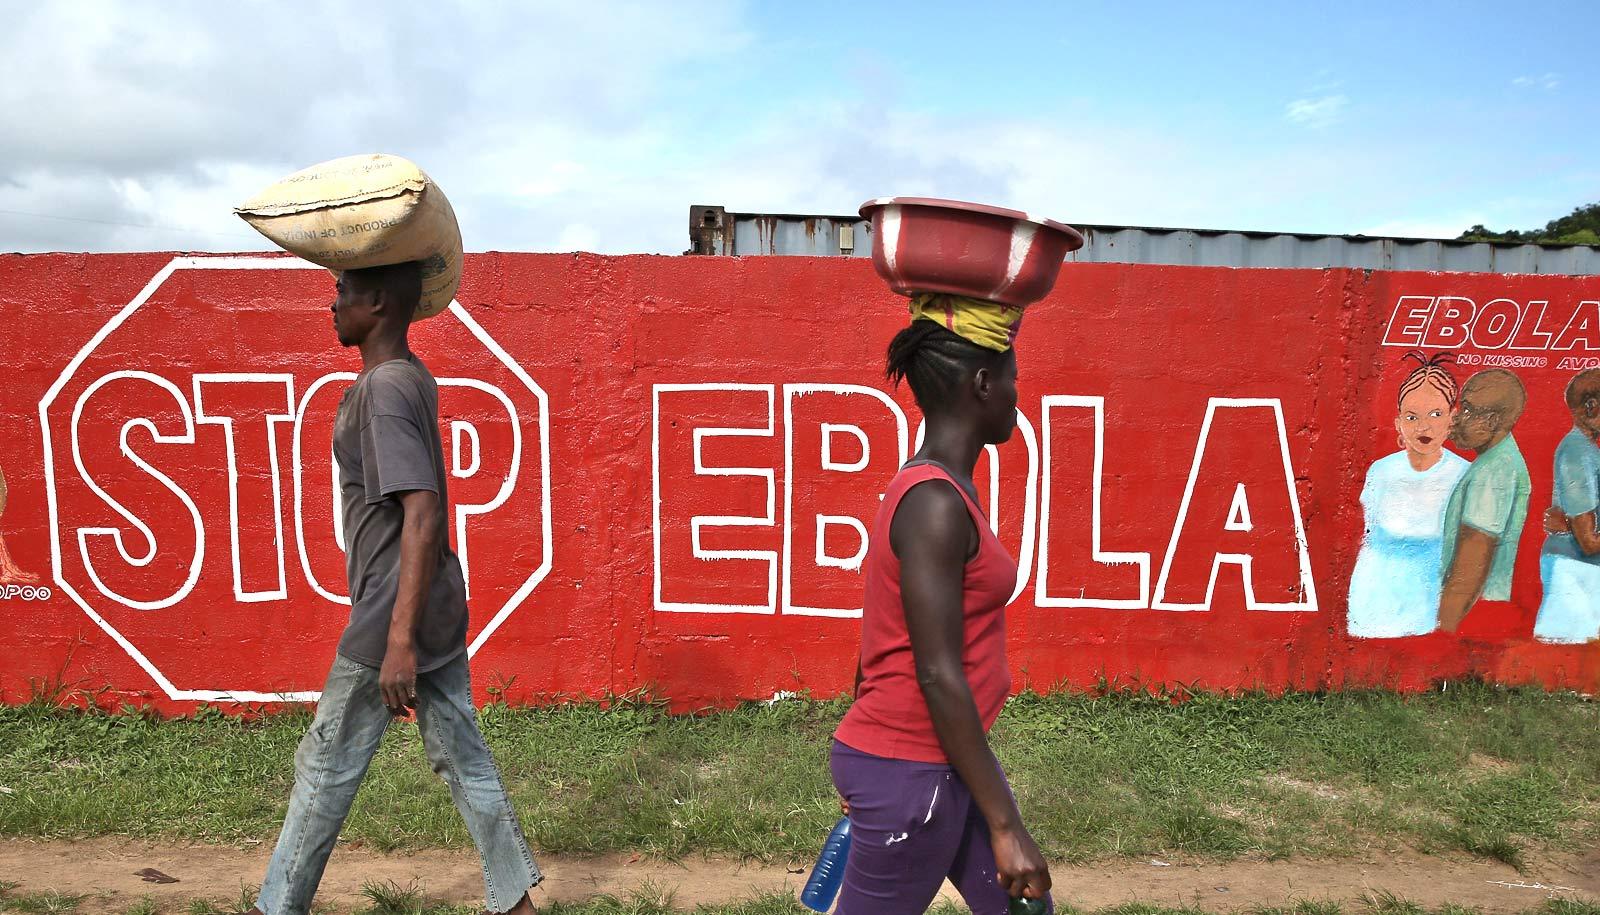 Ebola RNA lingers in semen longer than expected - Futurity